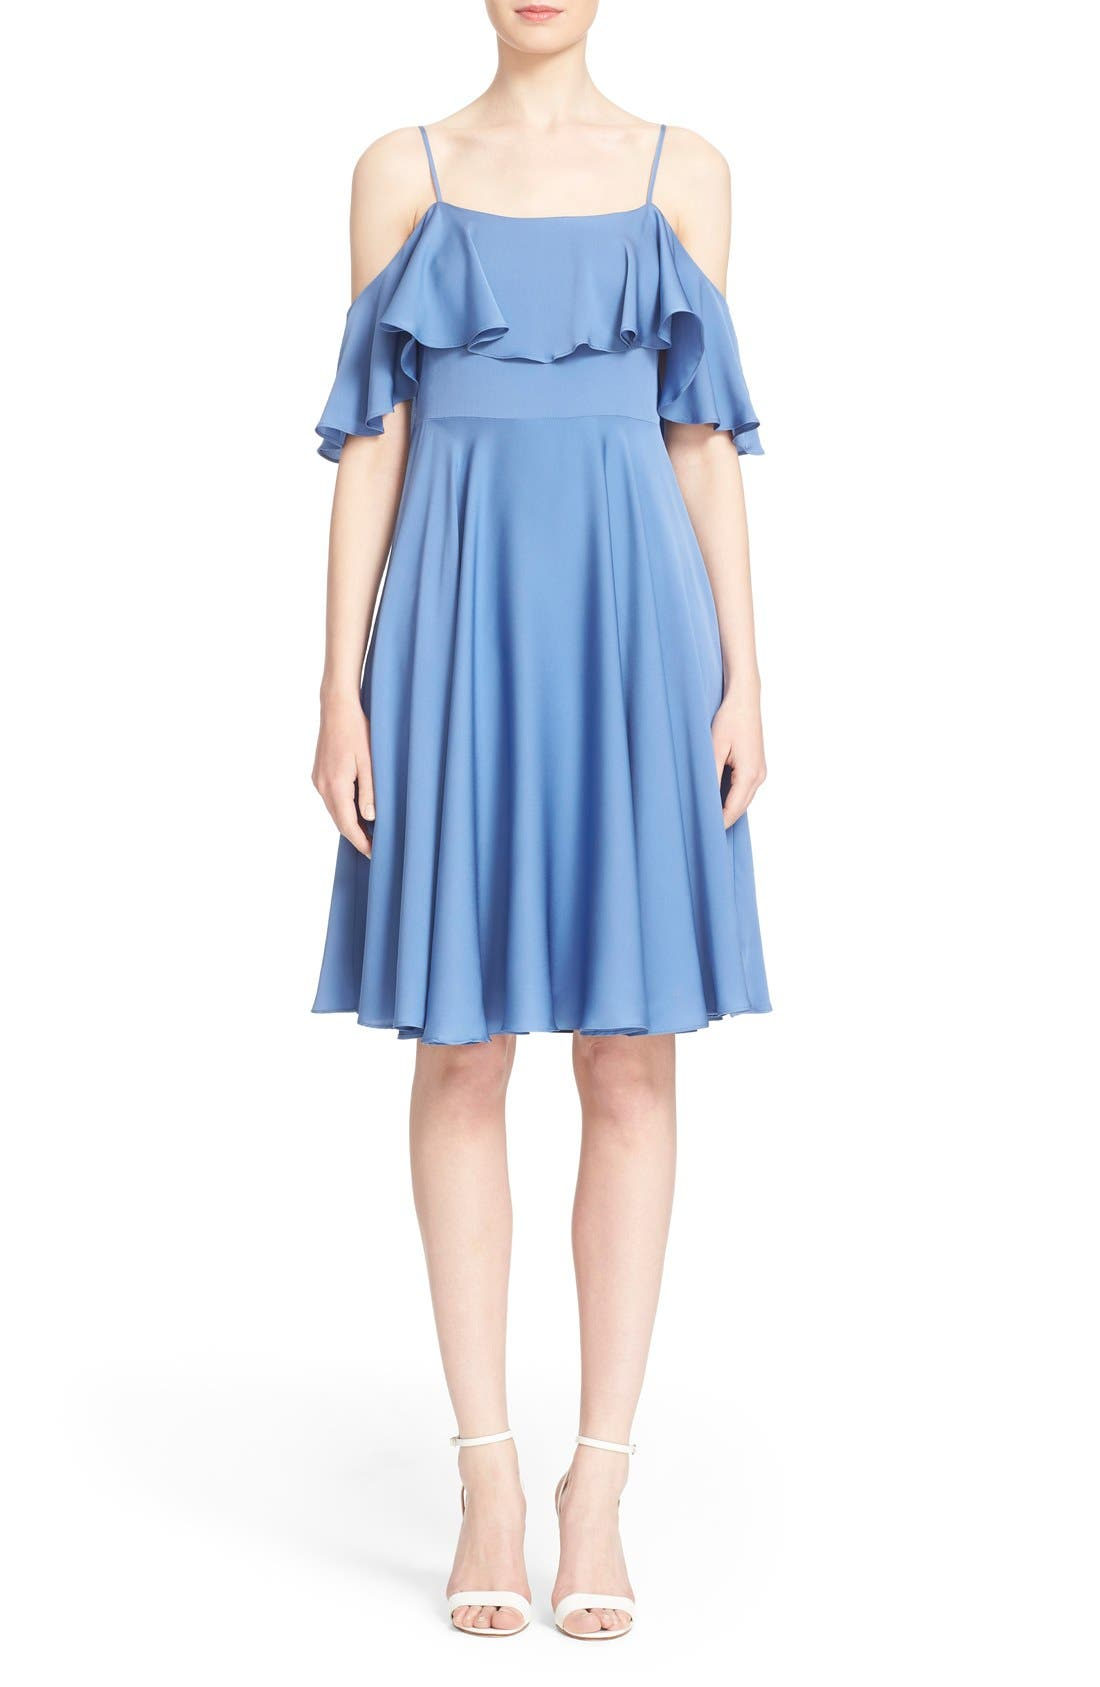 Main Image - Milly 'Emmaline' Ruffle Stretch Silk Dress